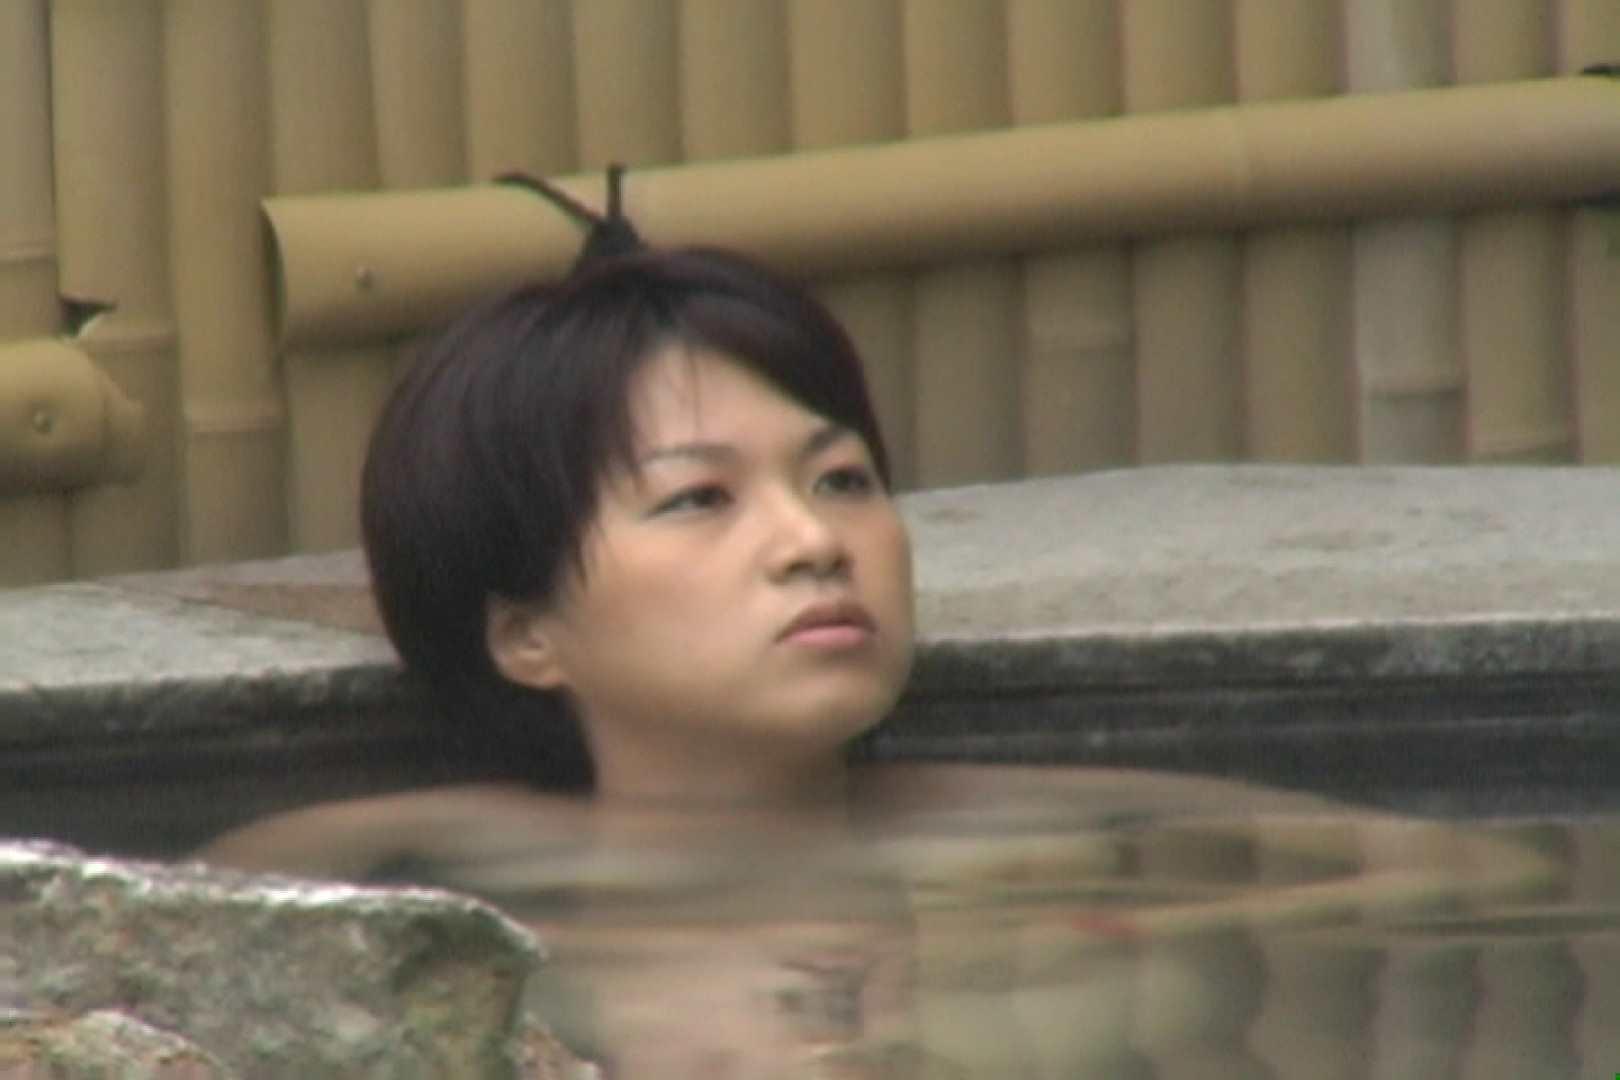 Aquaな露天風呂Vol.624 露天   OLセックス  52画像 1